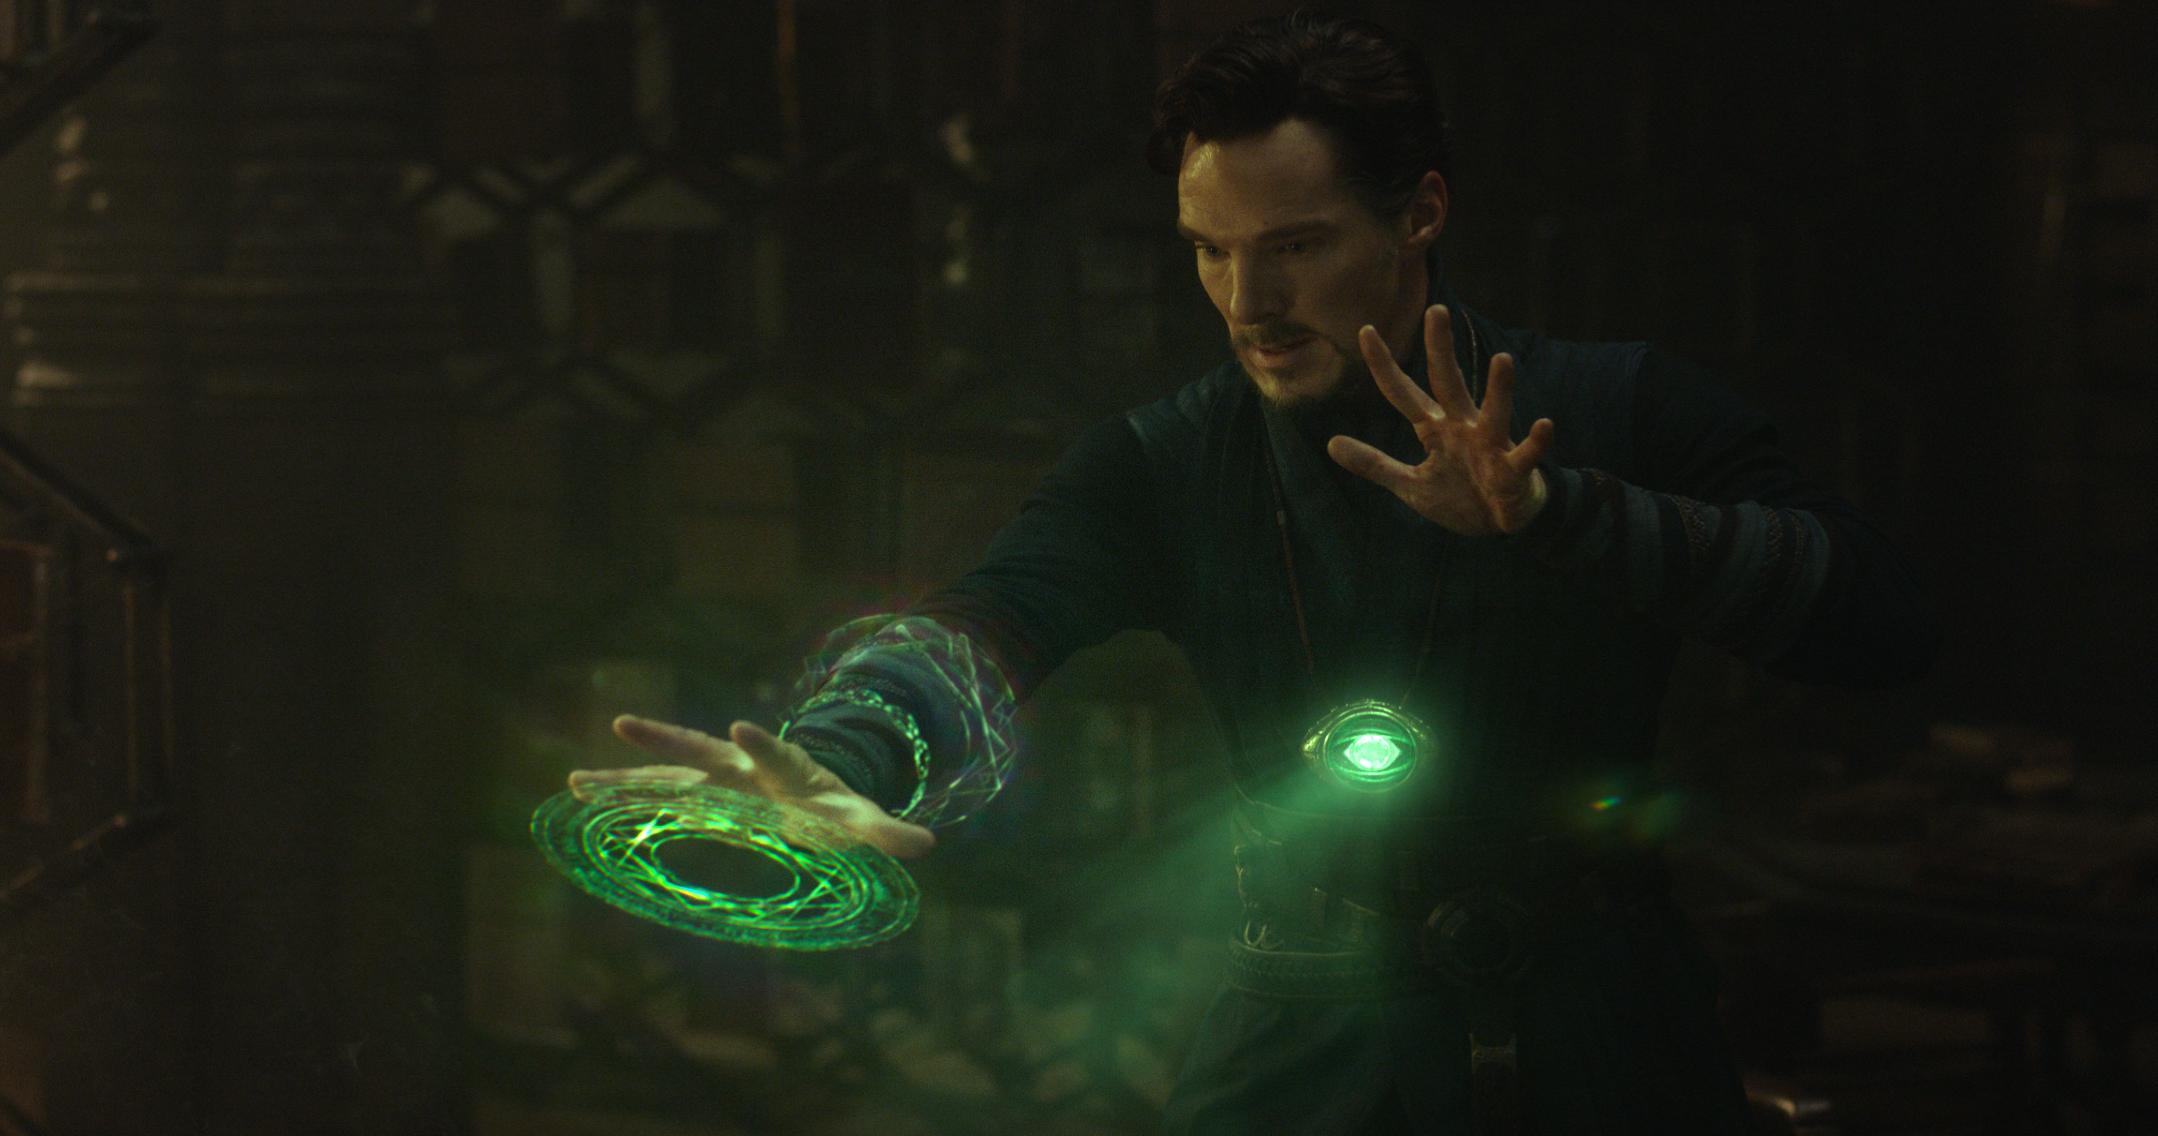 Doctor Strange doing his thing